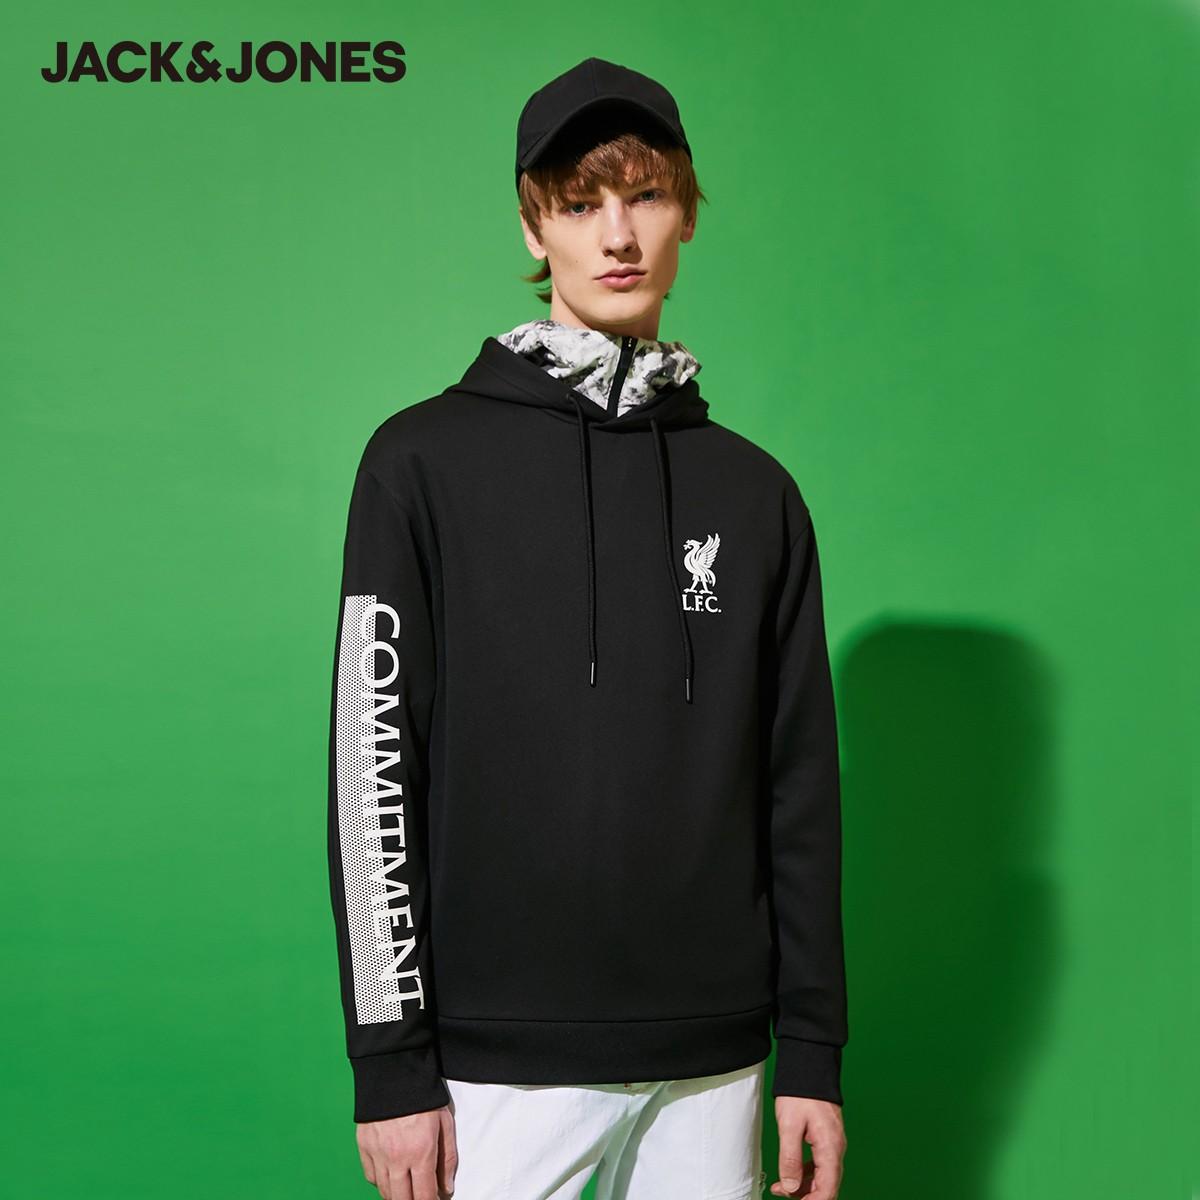 Jack Jones 杰克琼斯 220133549 男款利物浦球队联名卫衣